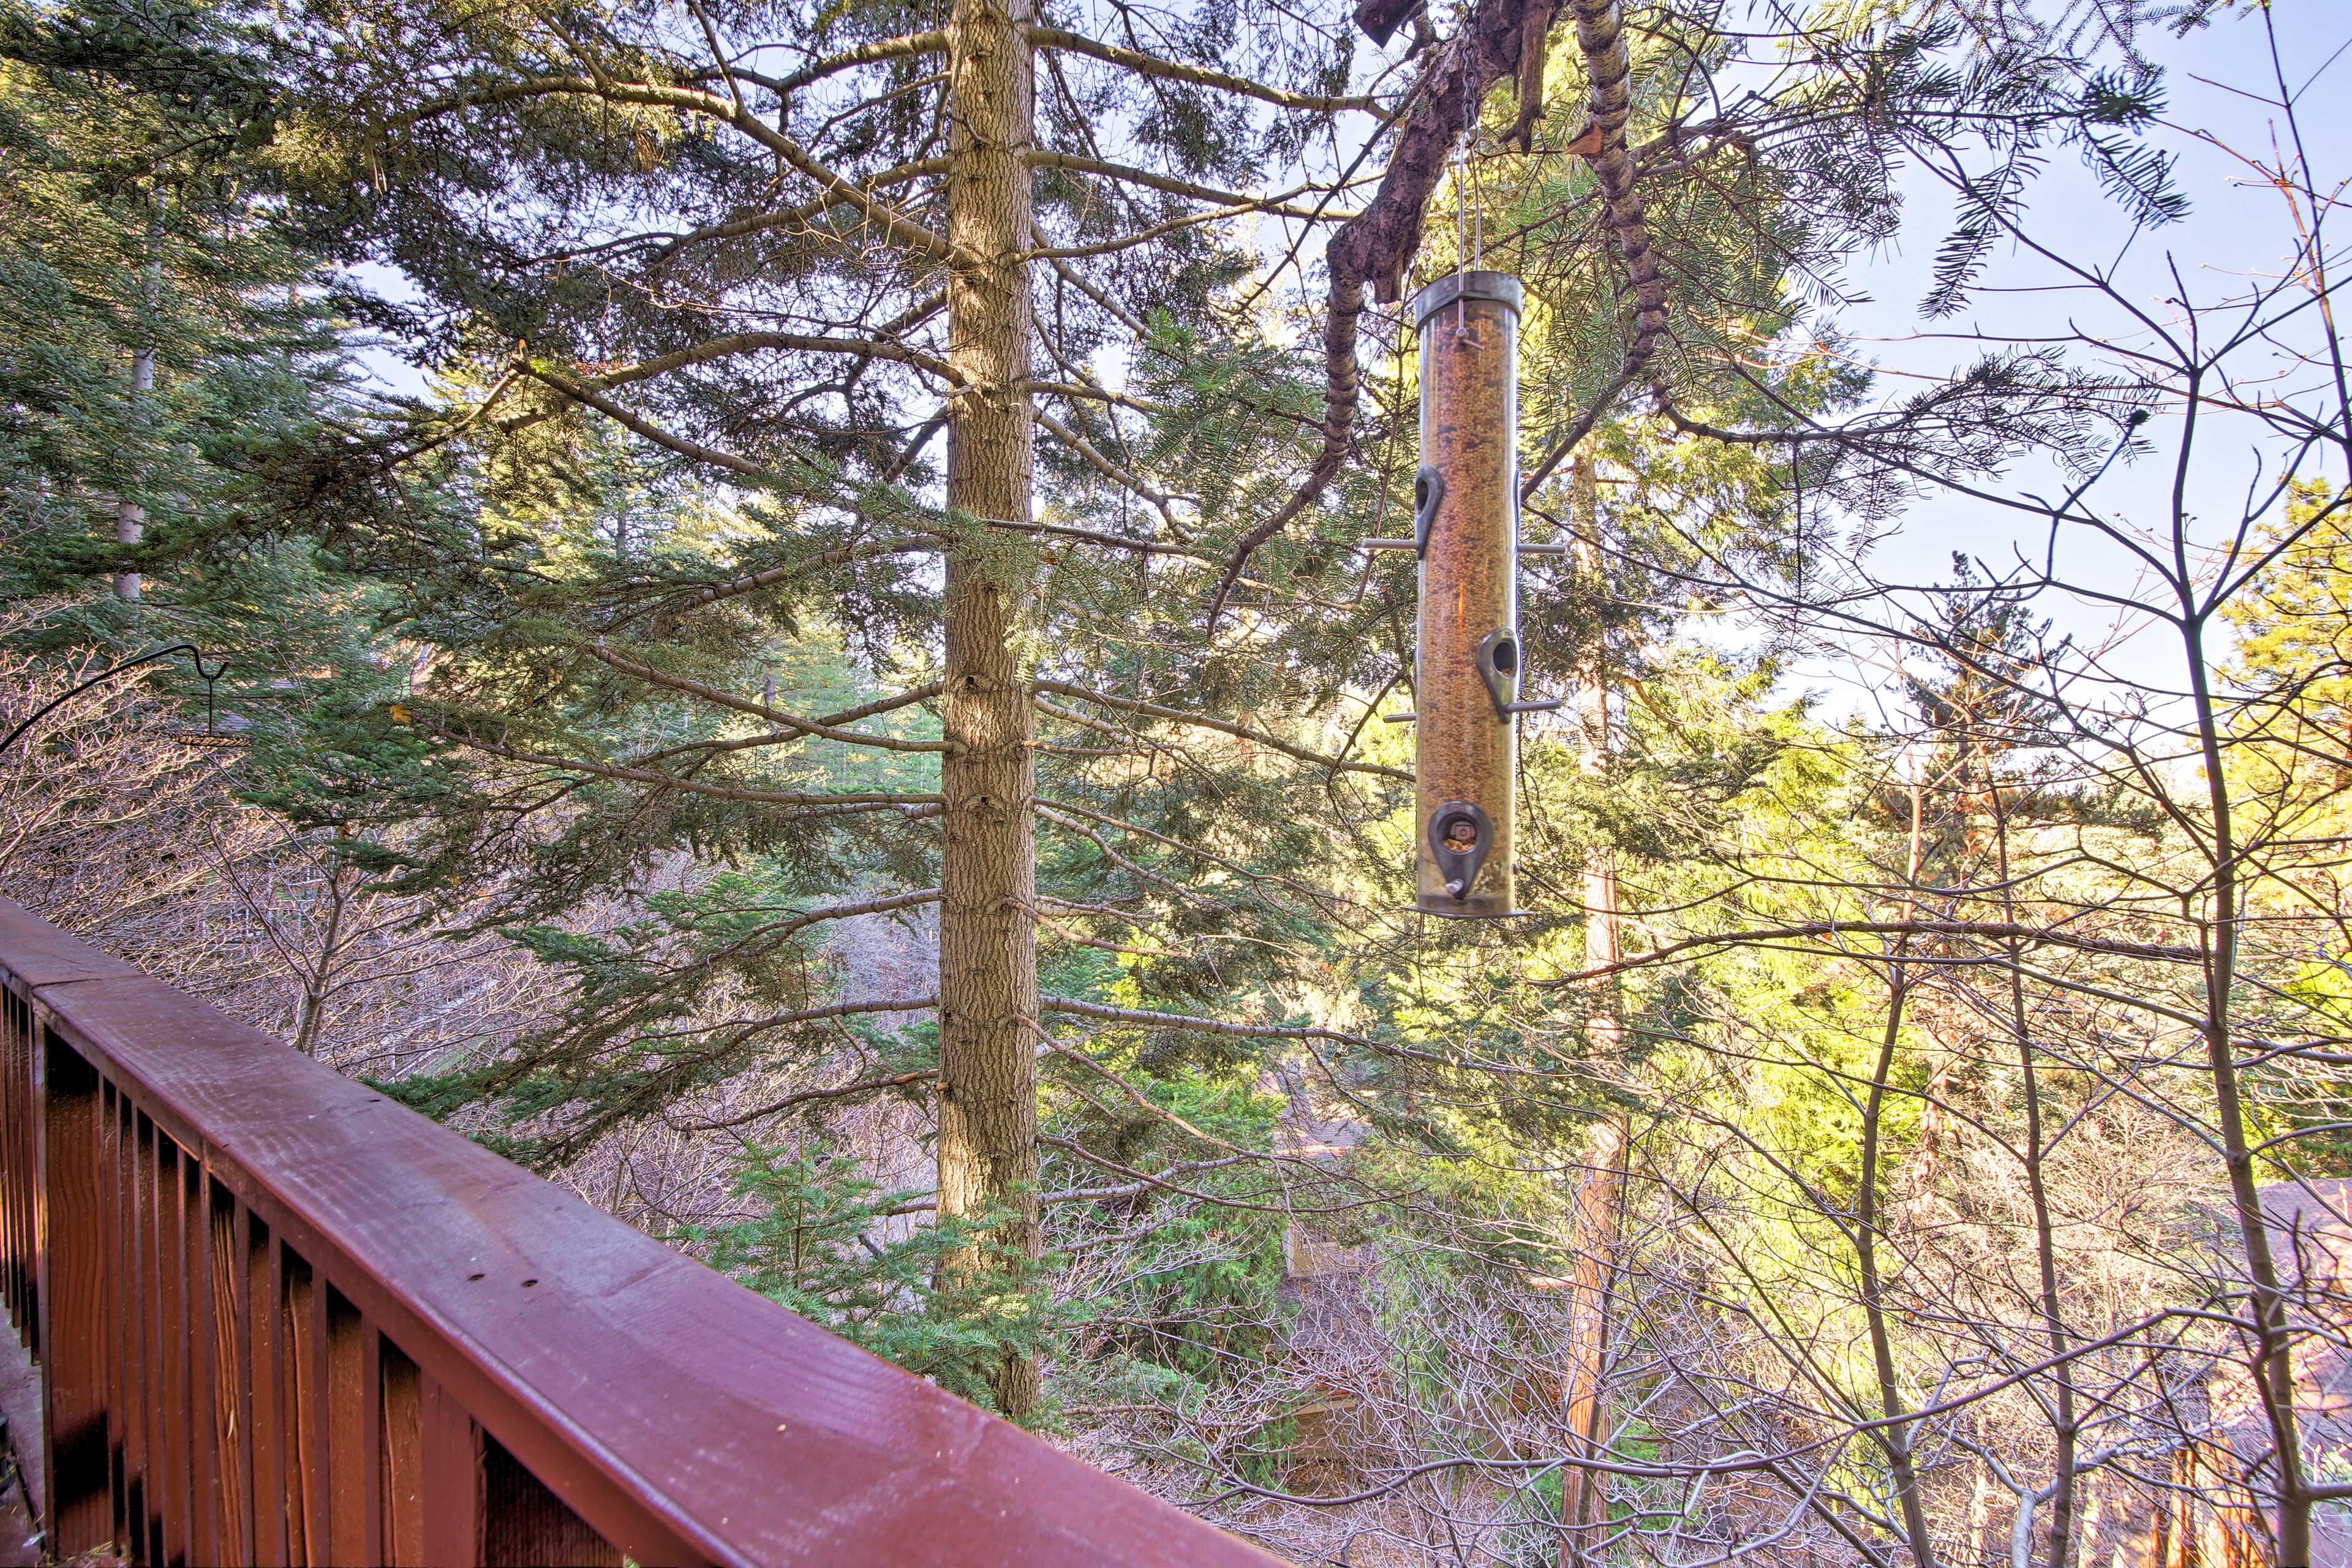 Your peaceful Lake Arrowhead retreat awaits. Book today!